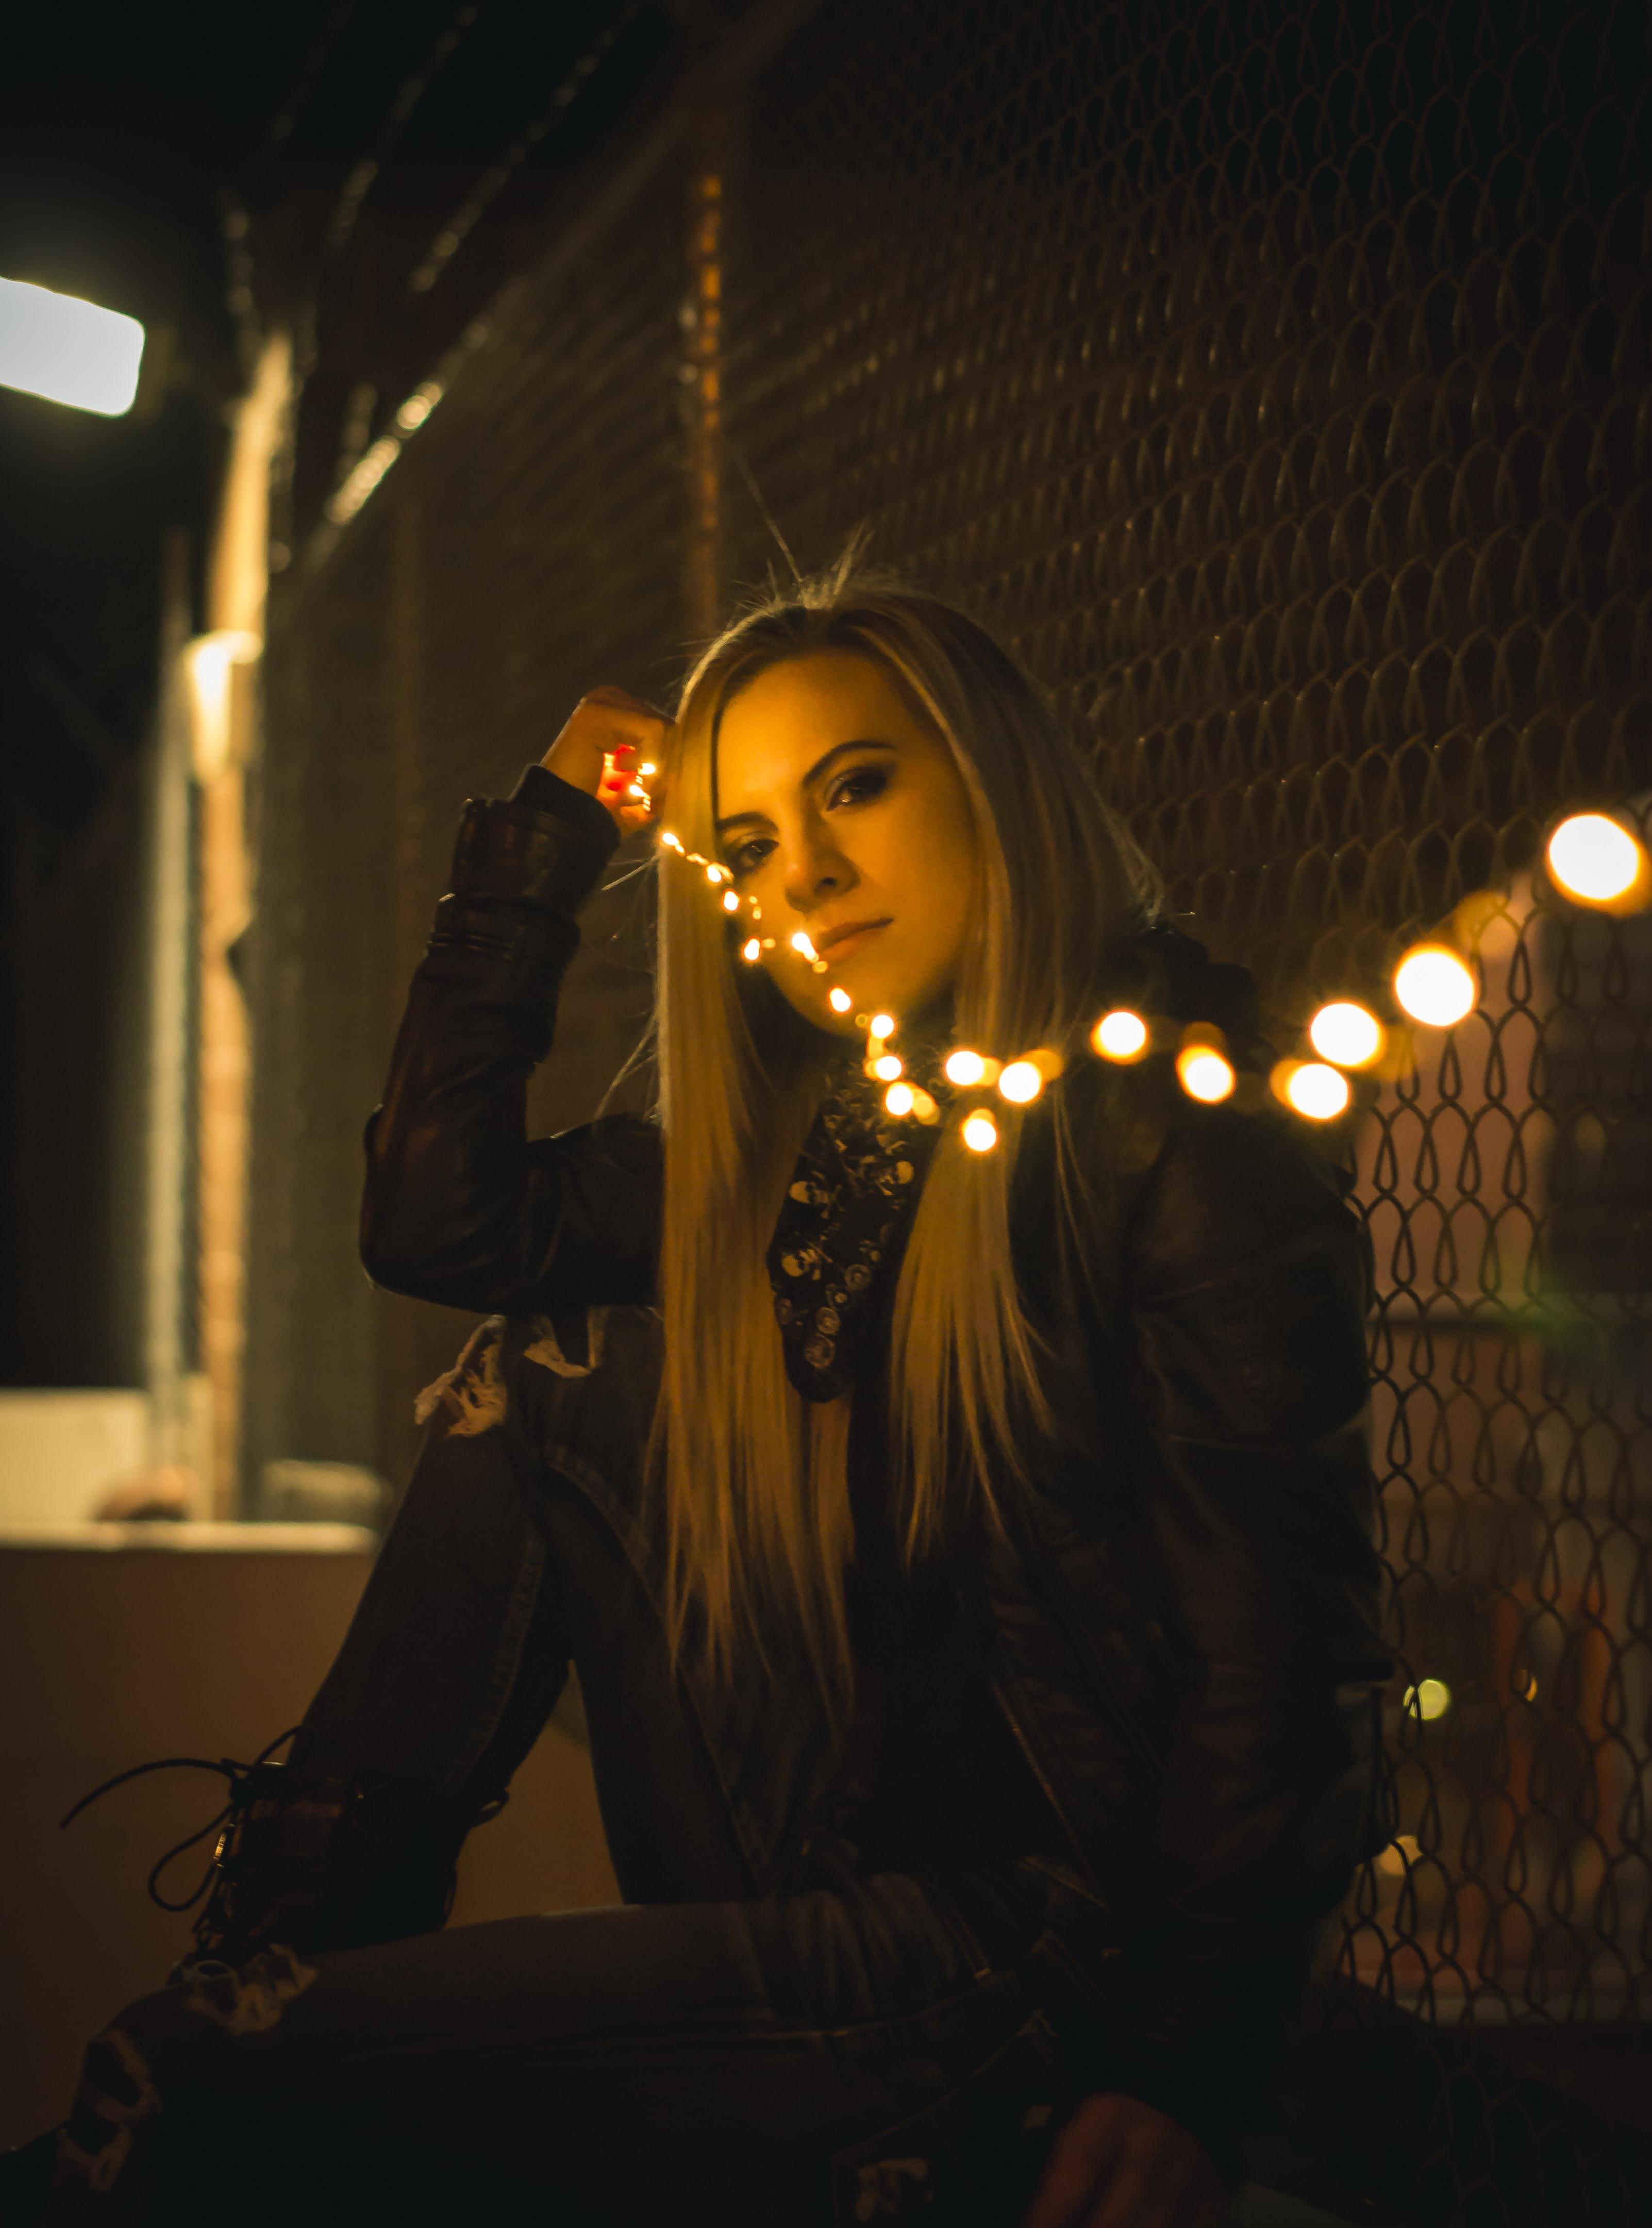 woman in black long-sleeved shirt holding string light